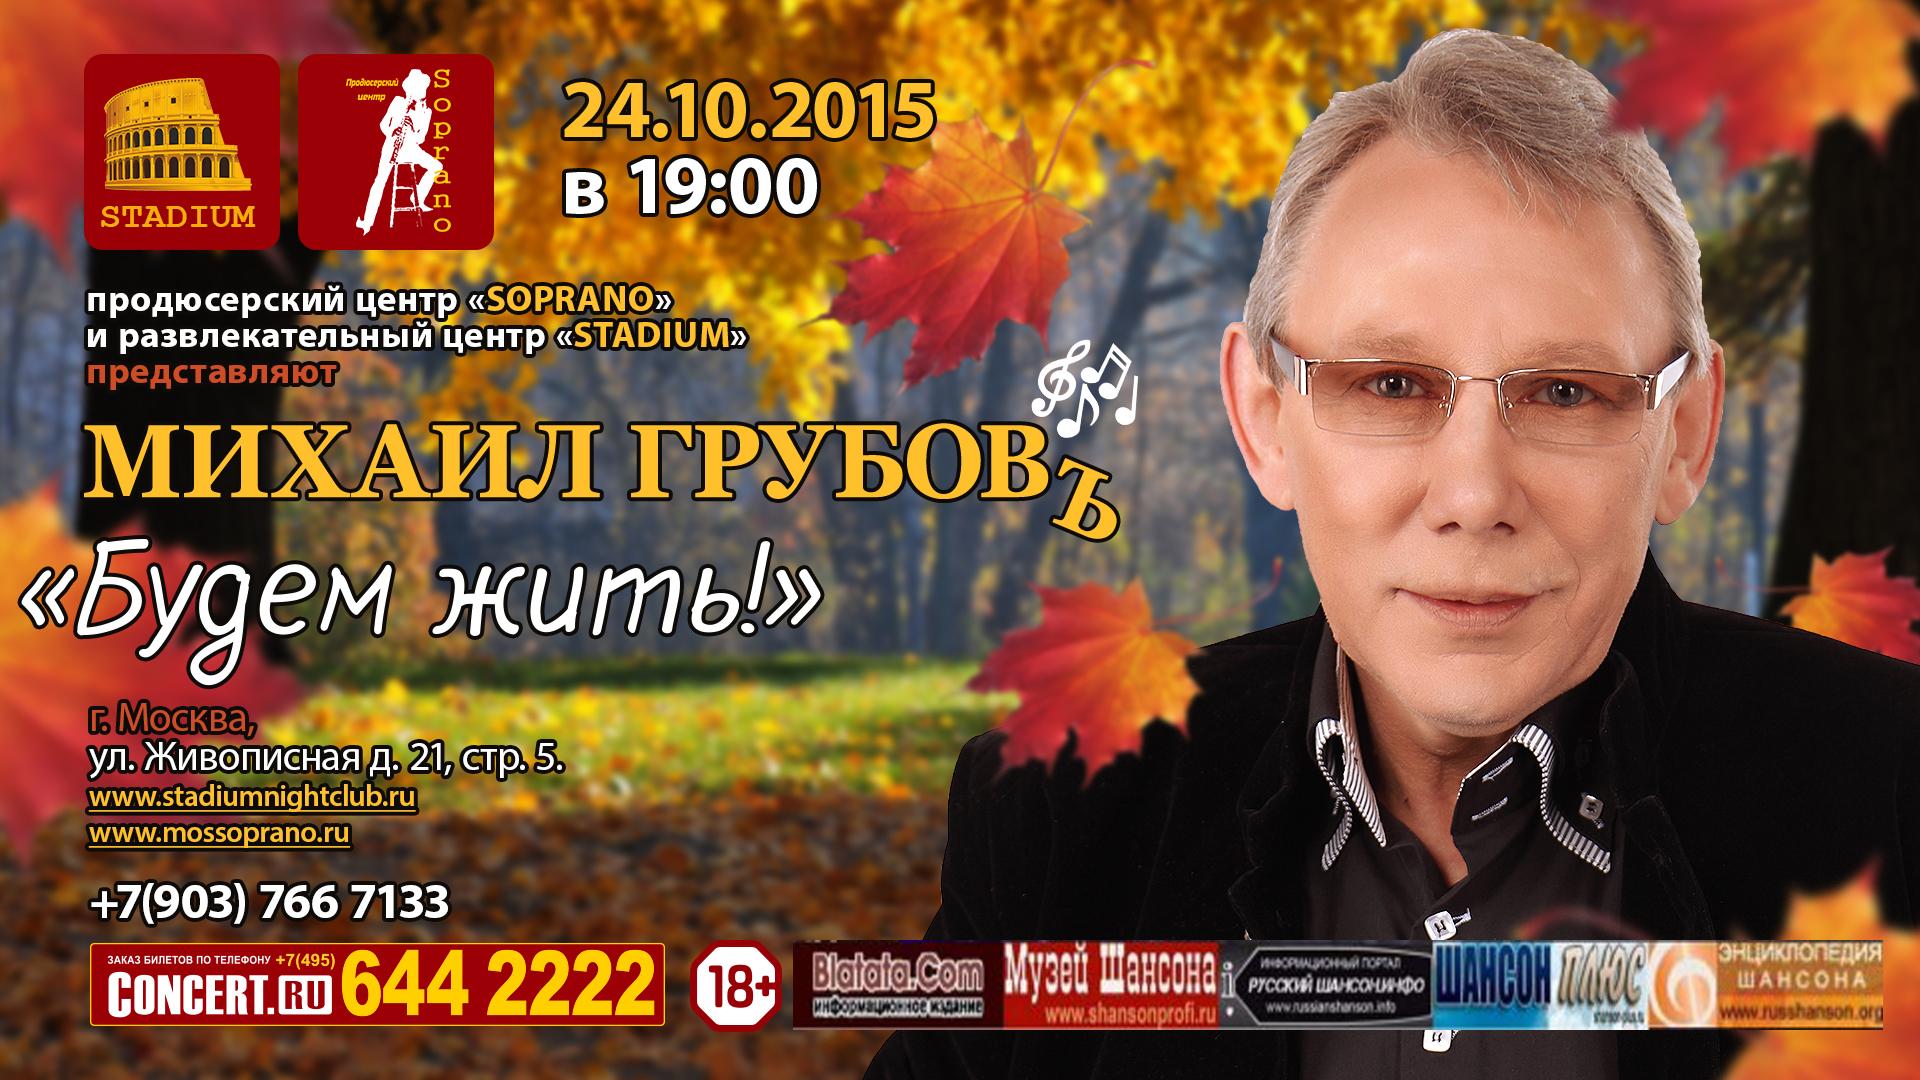 Концерт Михаила Грубова 24.10.2015